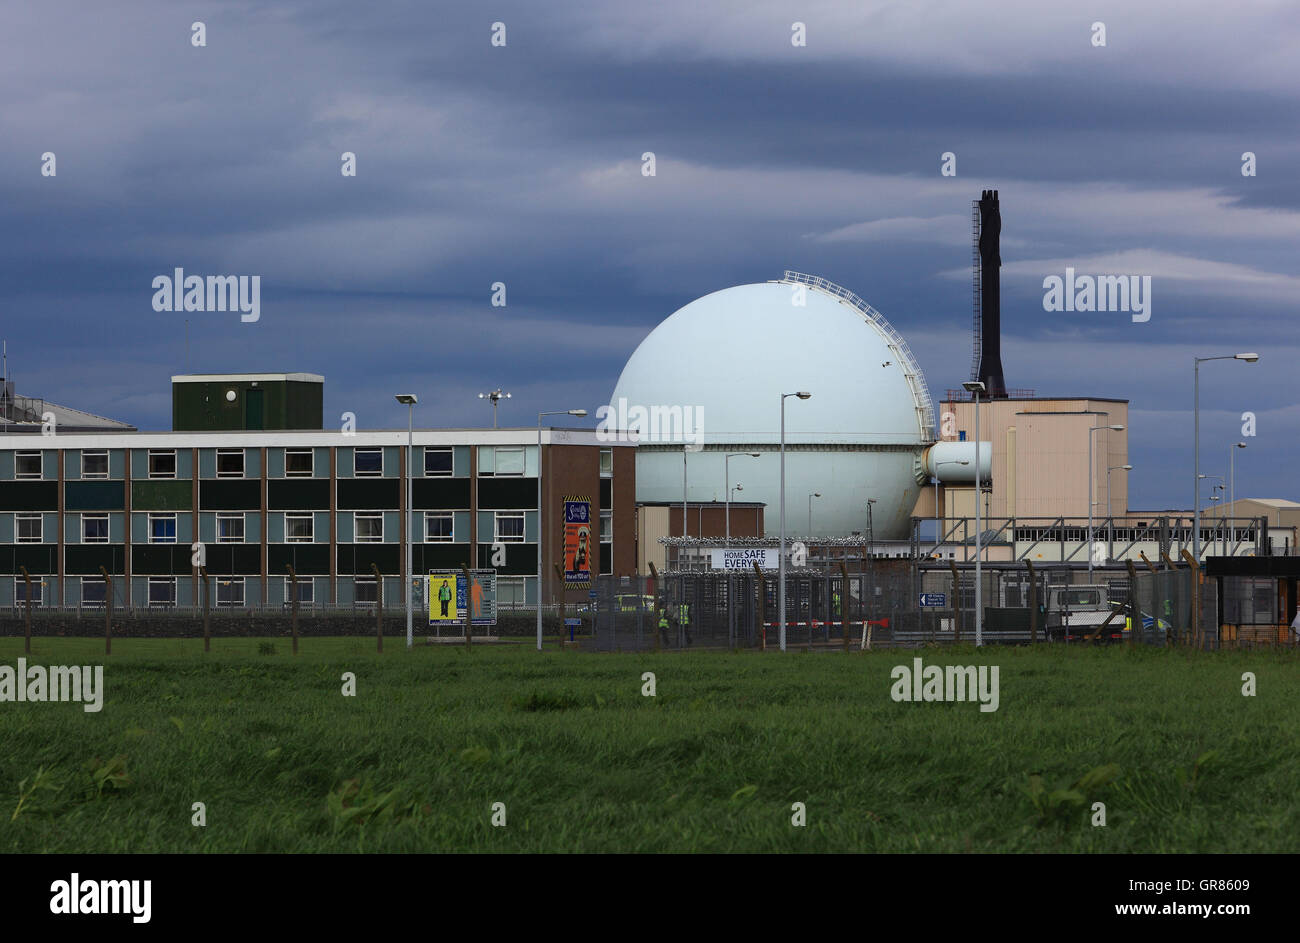 Scotland, highlands, north coast of Scotland, Donreay KKW, prototype Almost Reactor - Stock Image